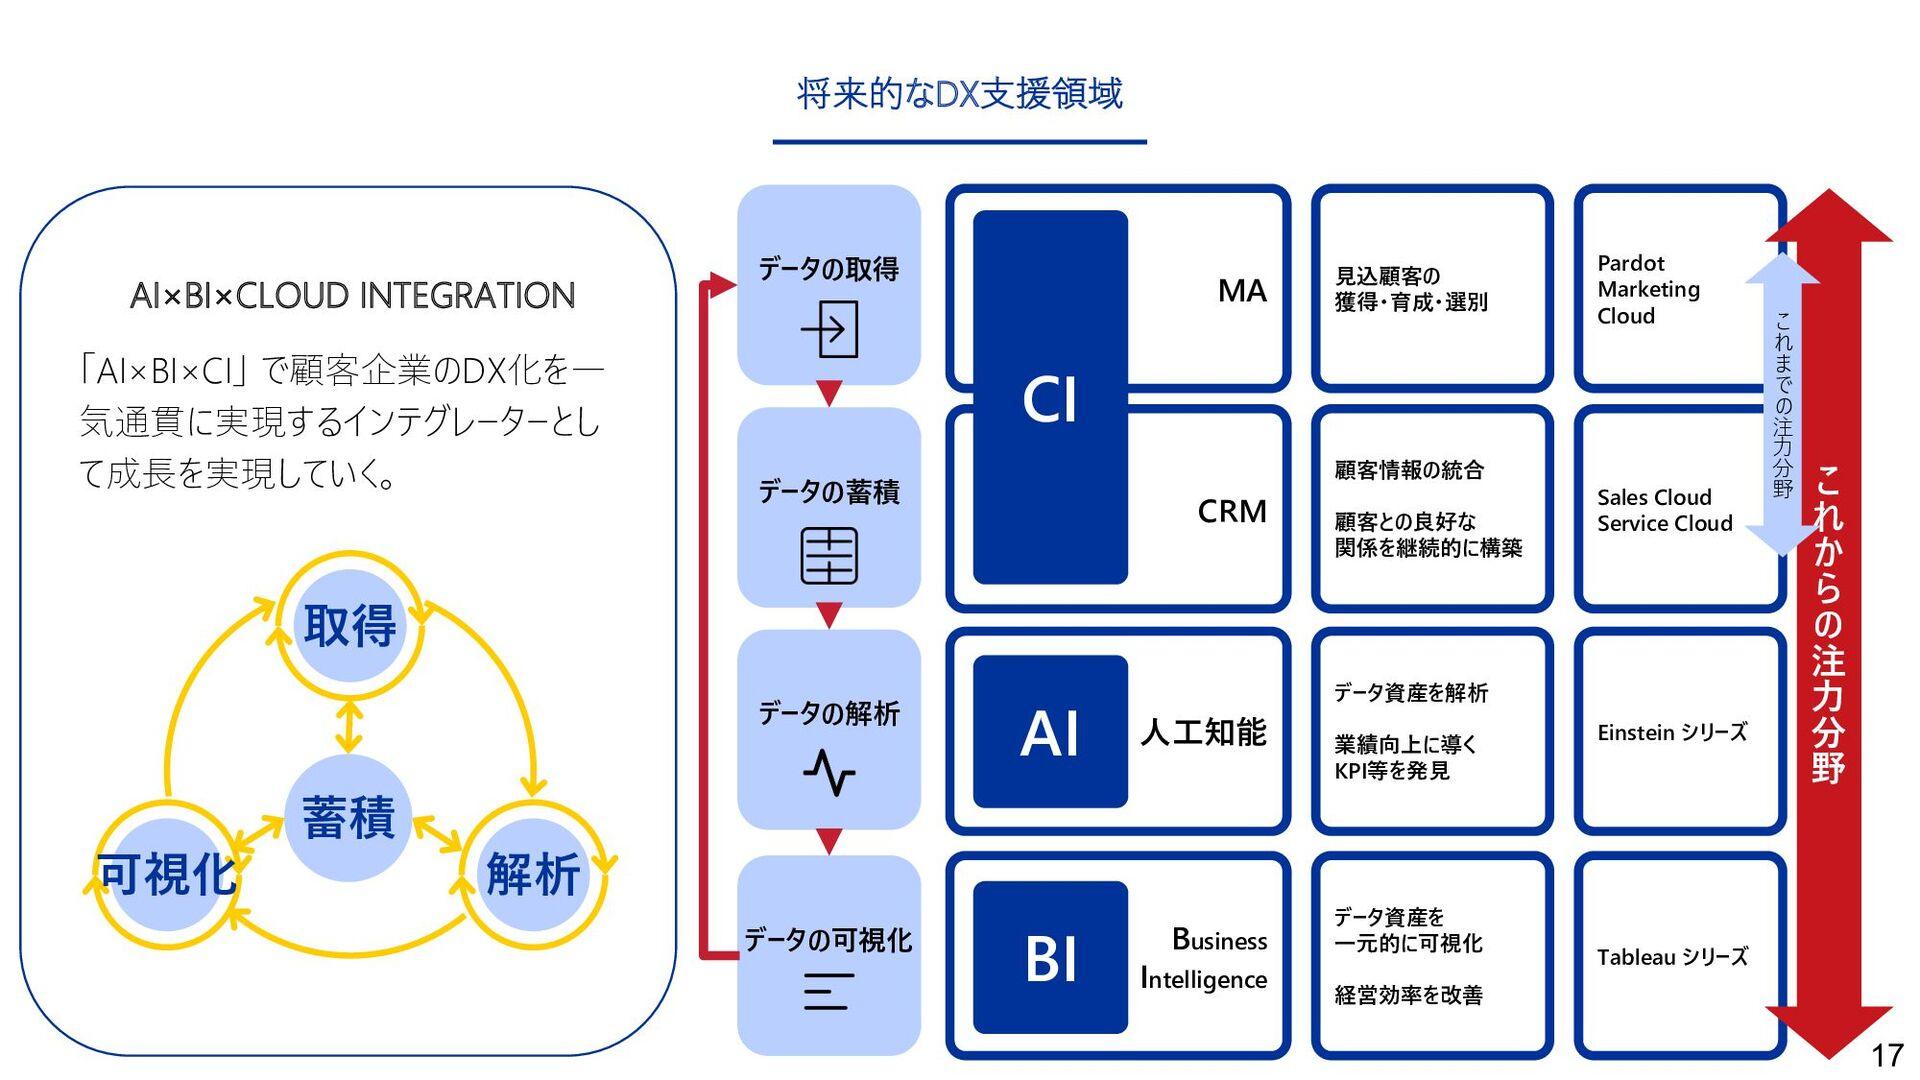 17 「AI×BI×CI」 で顧客企業のDX化を⼀ 気通貫に実現するインテグレーターとし て成...